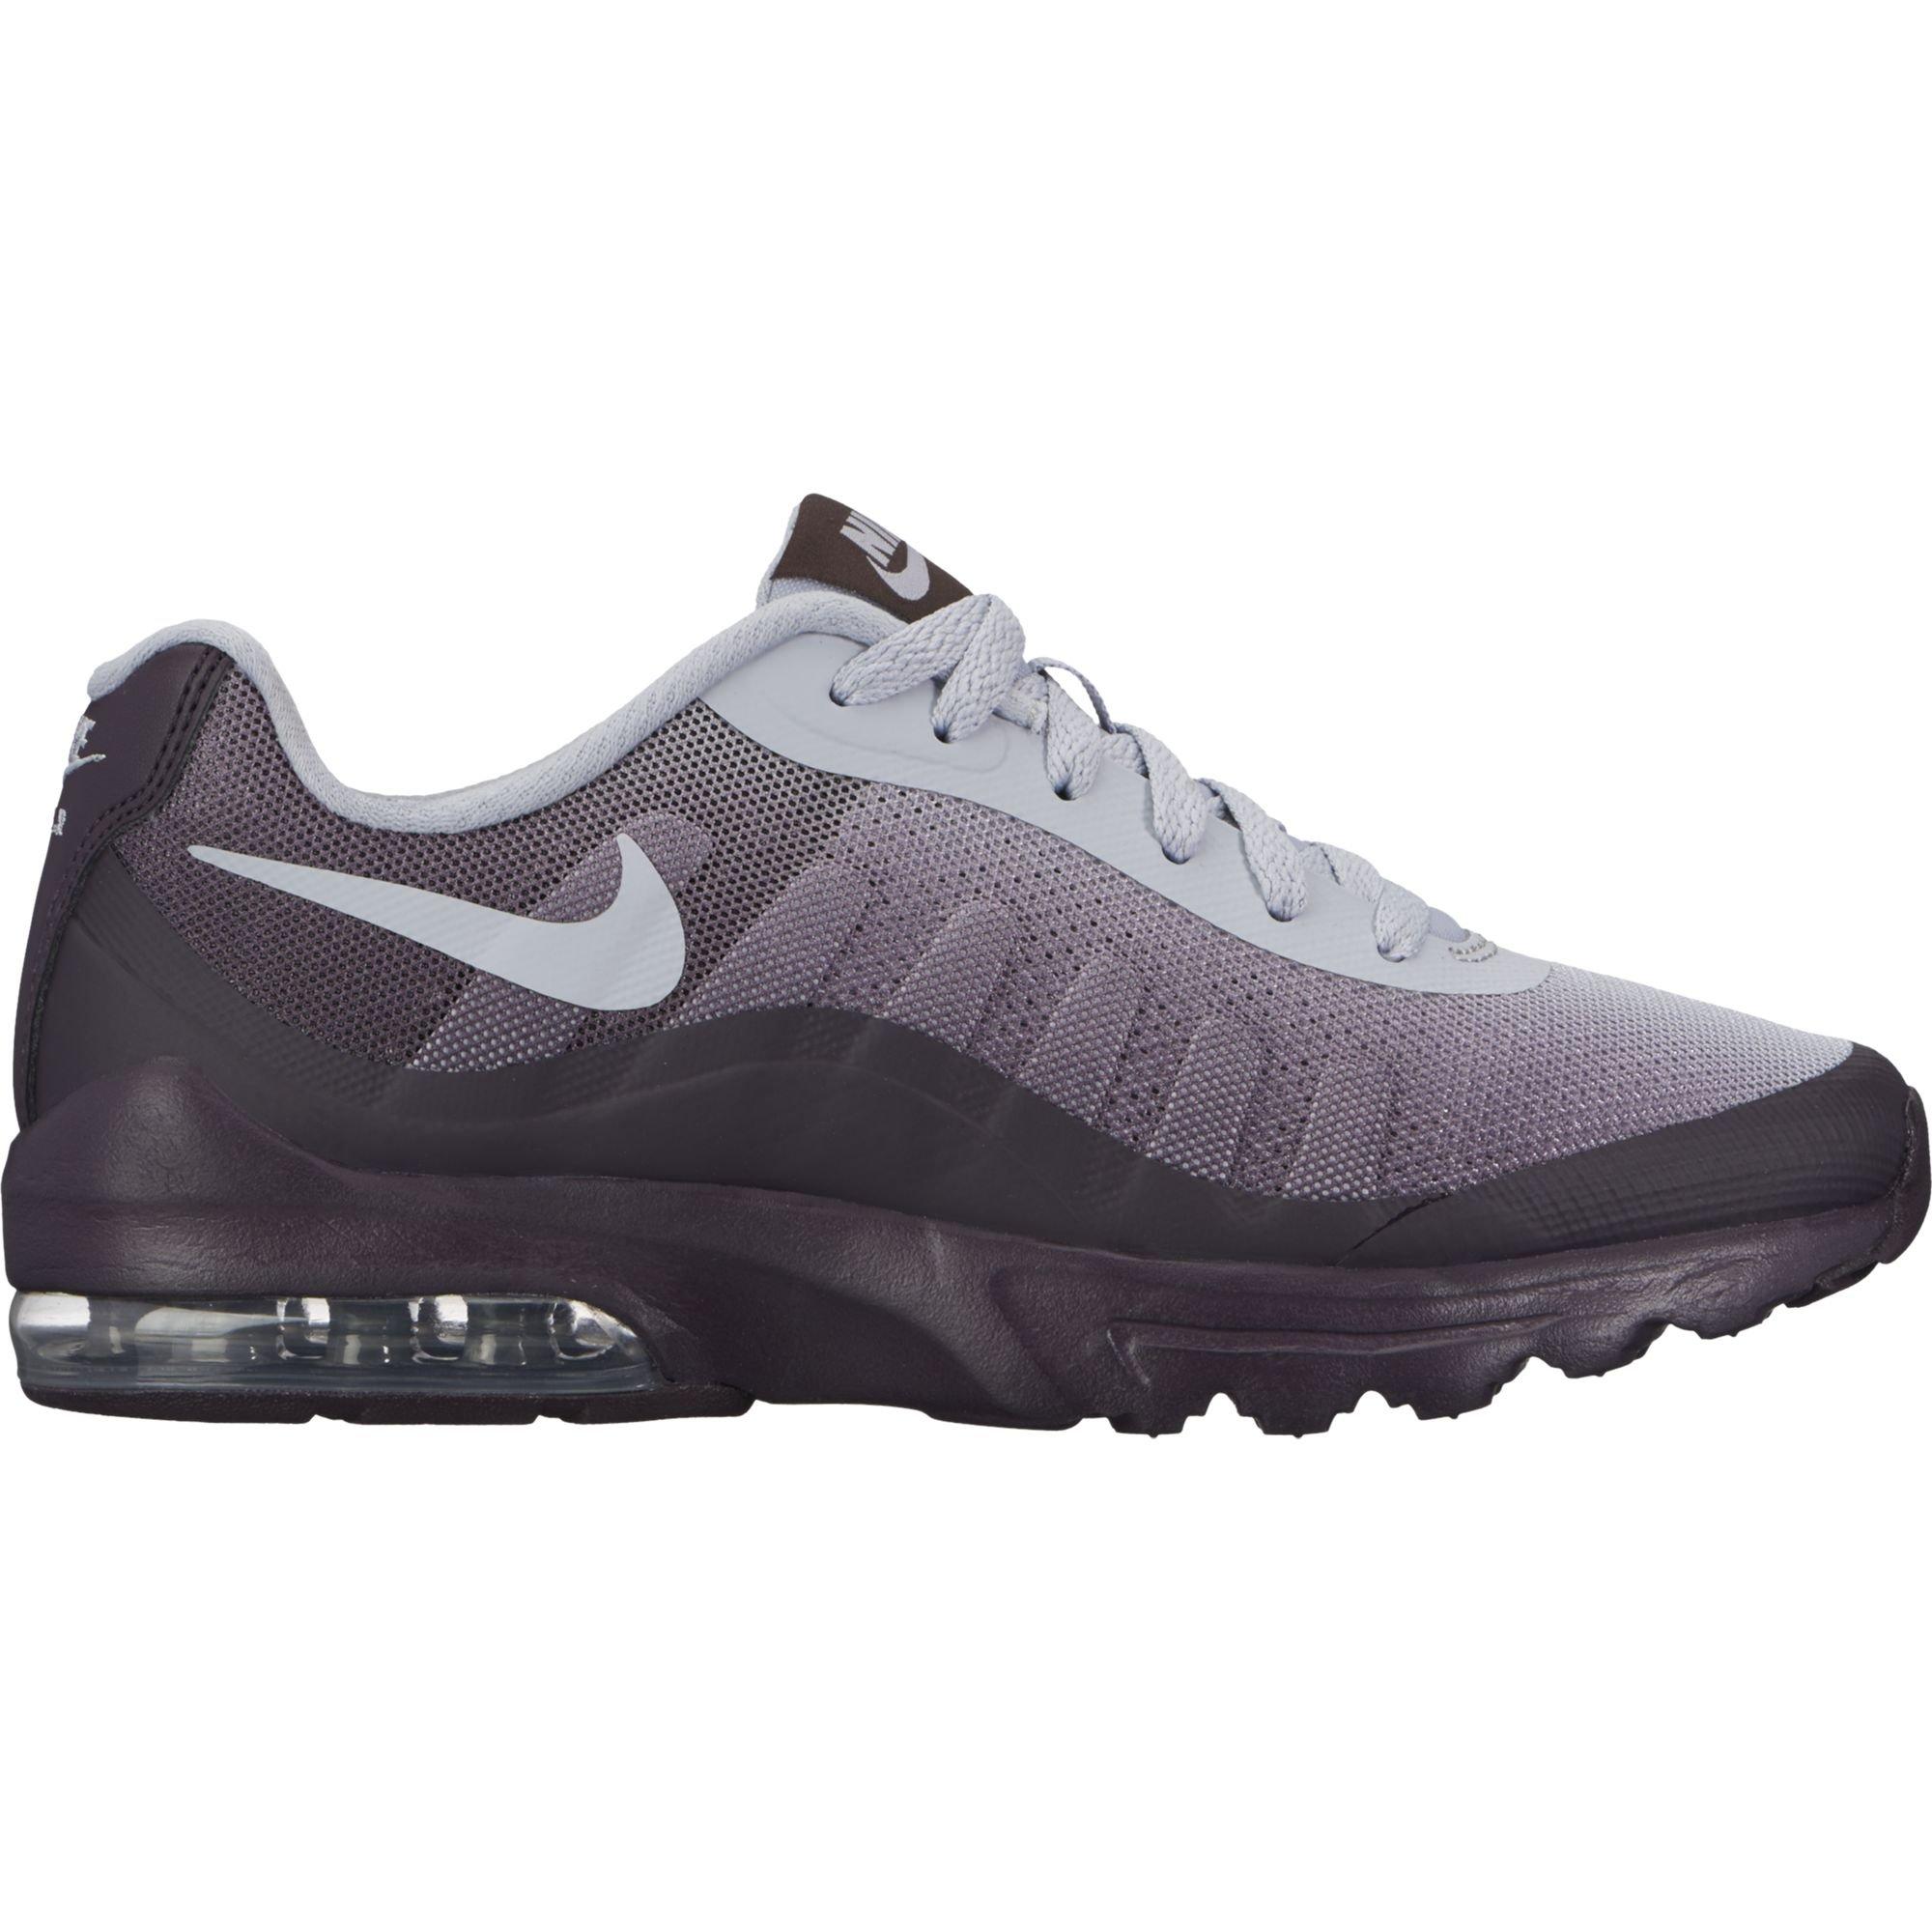 edadbda571 ... Torch 4 Running Shoe Womens Nike Air Max Invigor Print Shoe Port  WineWolf Grey Size 8 .